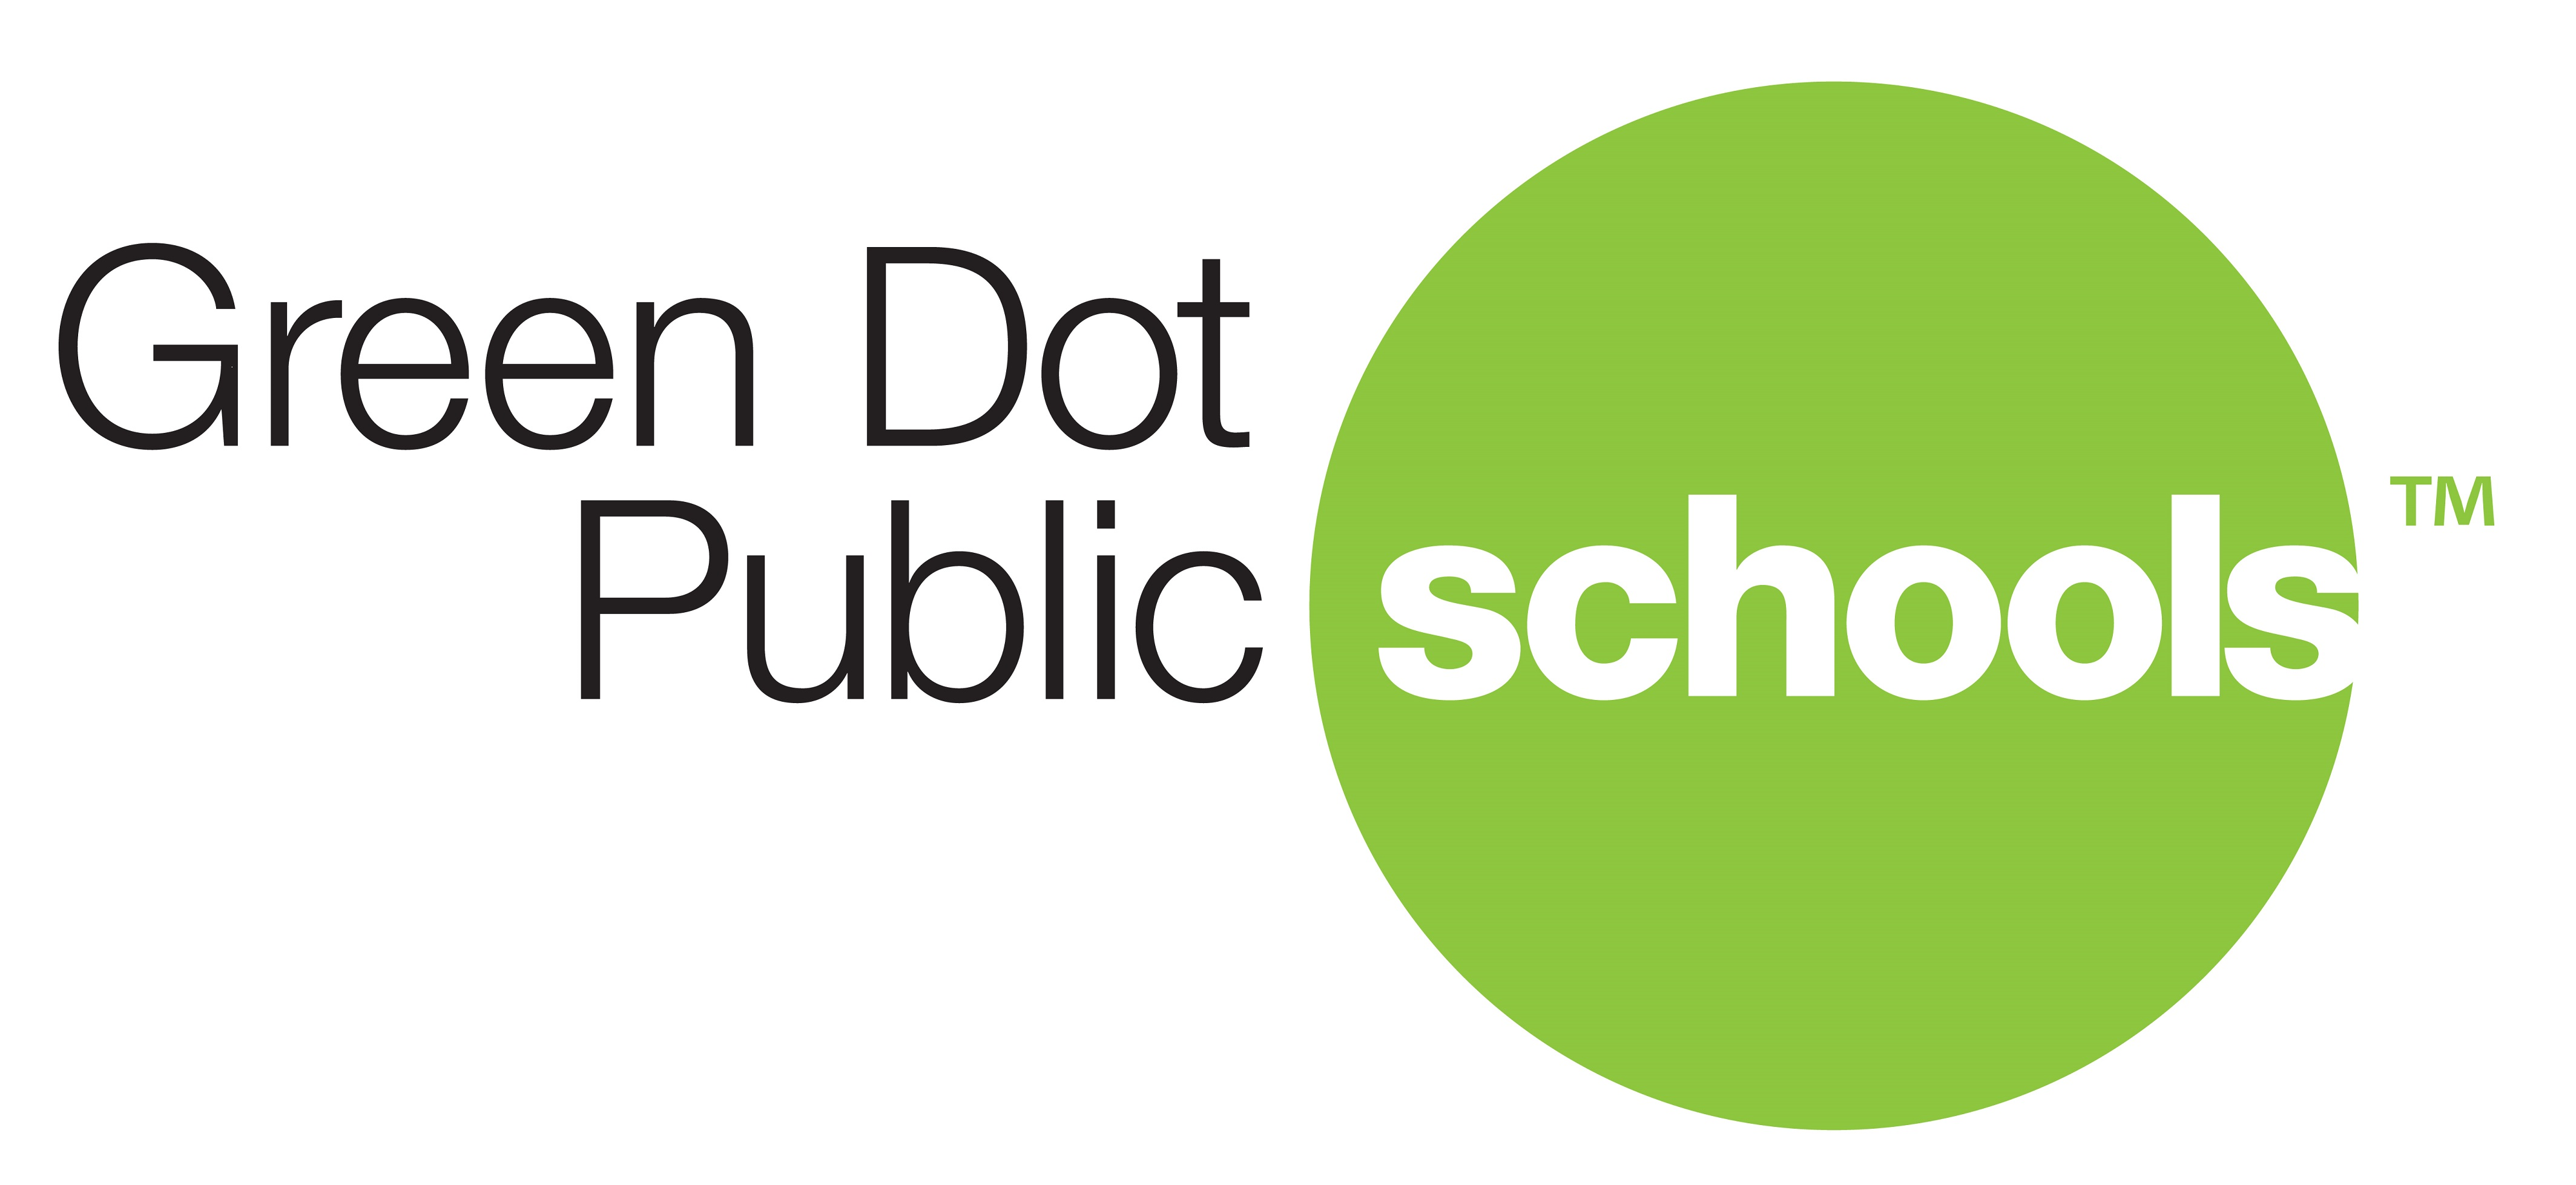 Green Dot Public Schools Tennessee logo